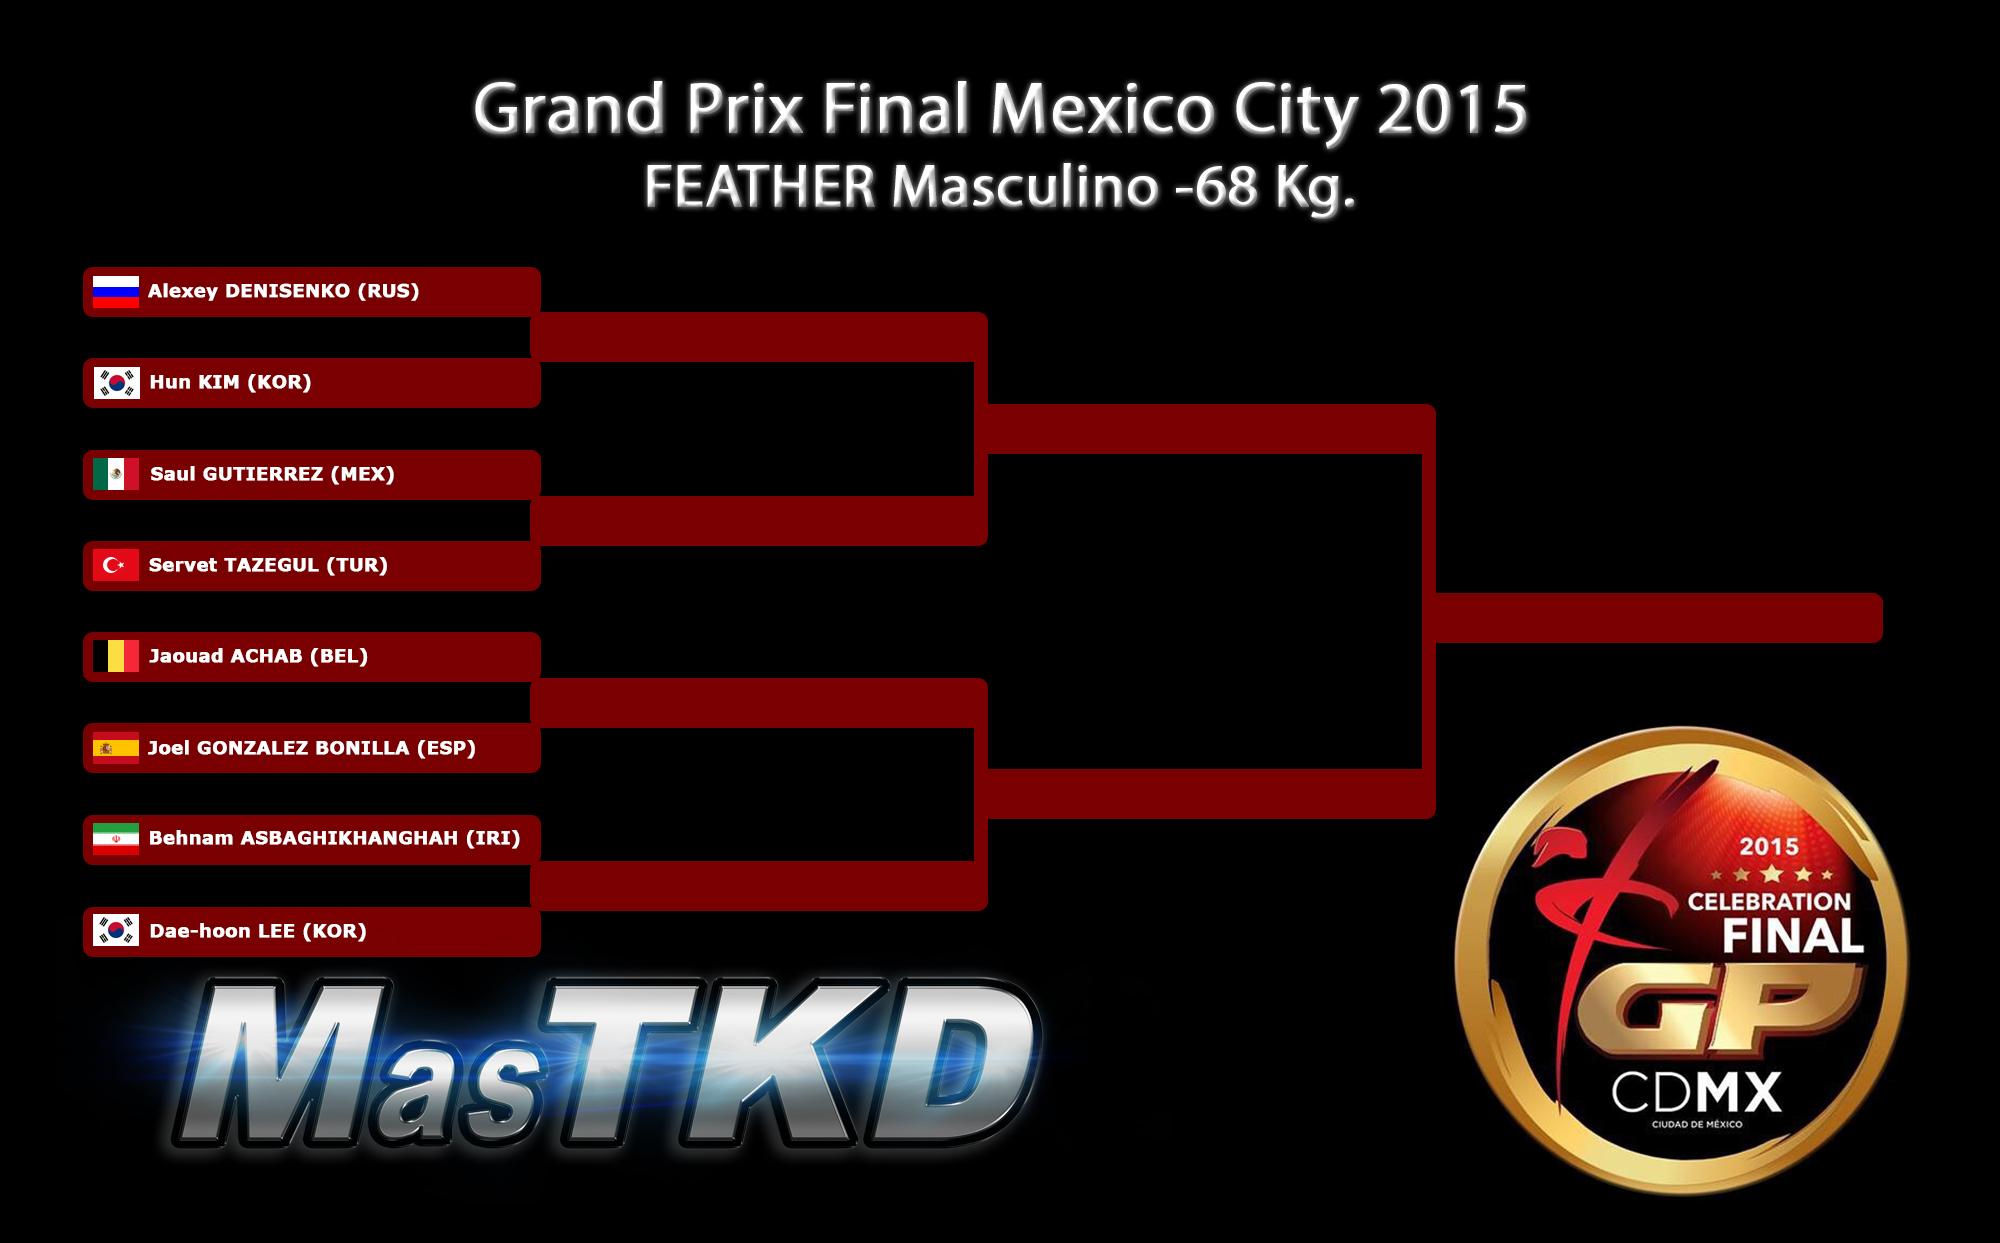 M-68_Grafica_GPFinal_MexicoCity2015